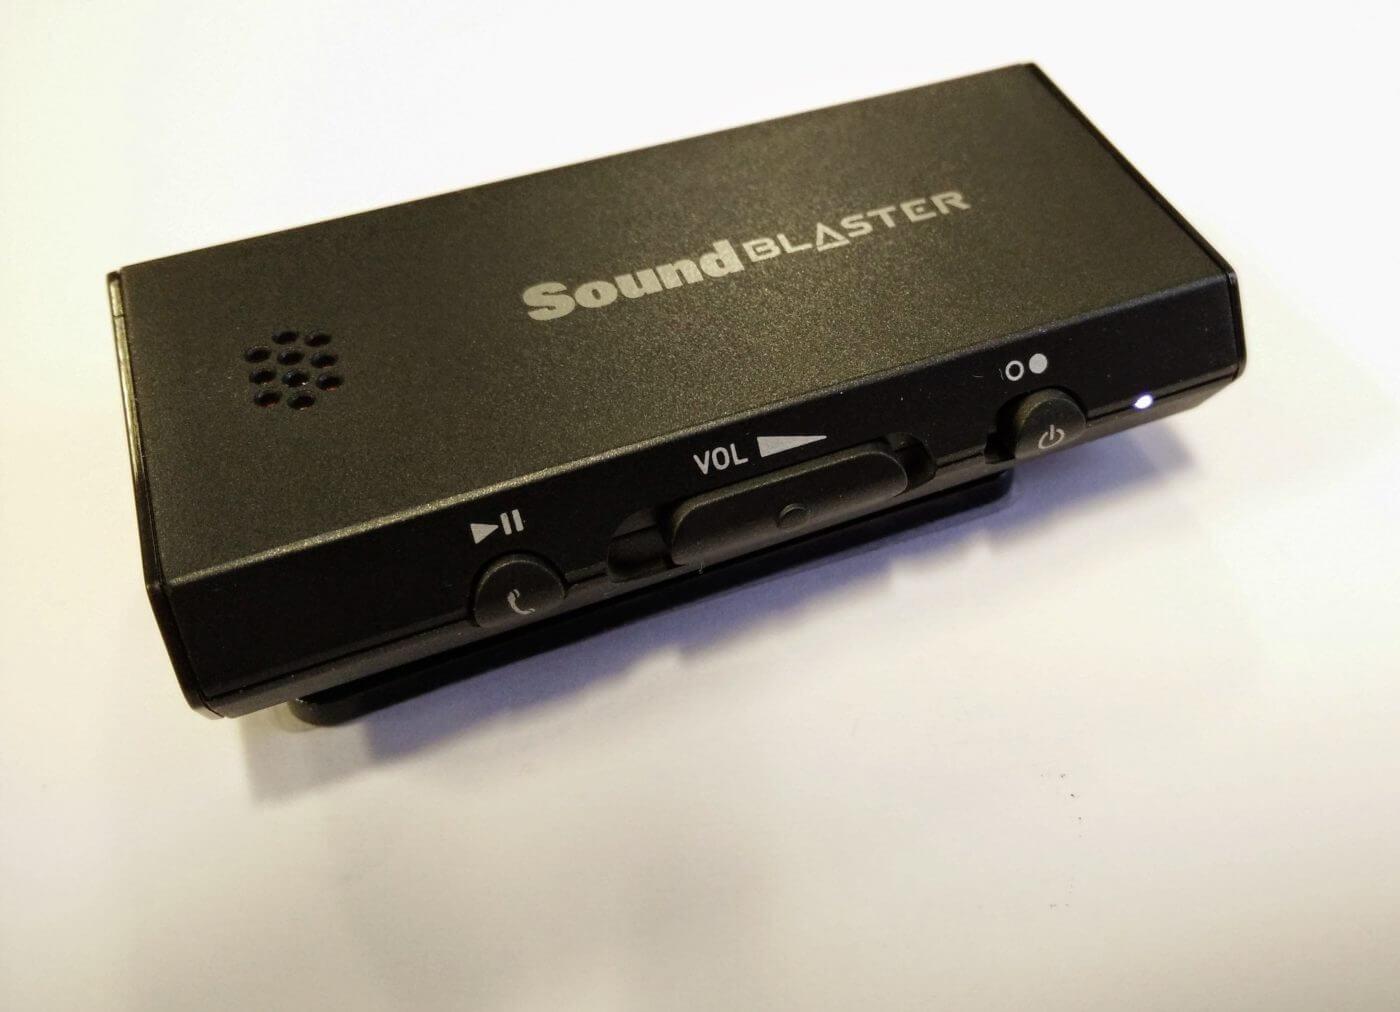 Creative Sound Blaster E1 Portable Amplifier Review - Geek News Central